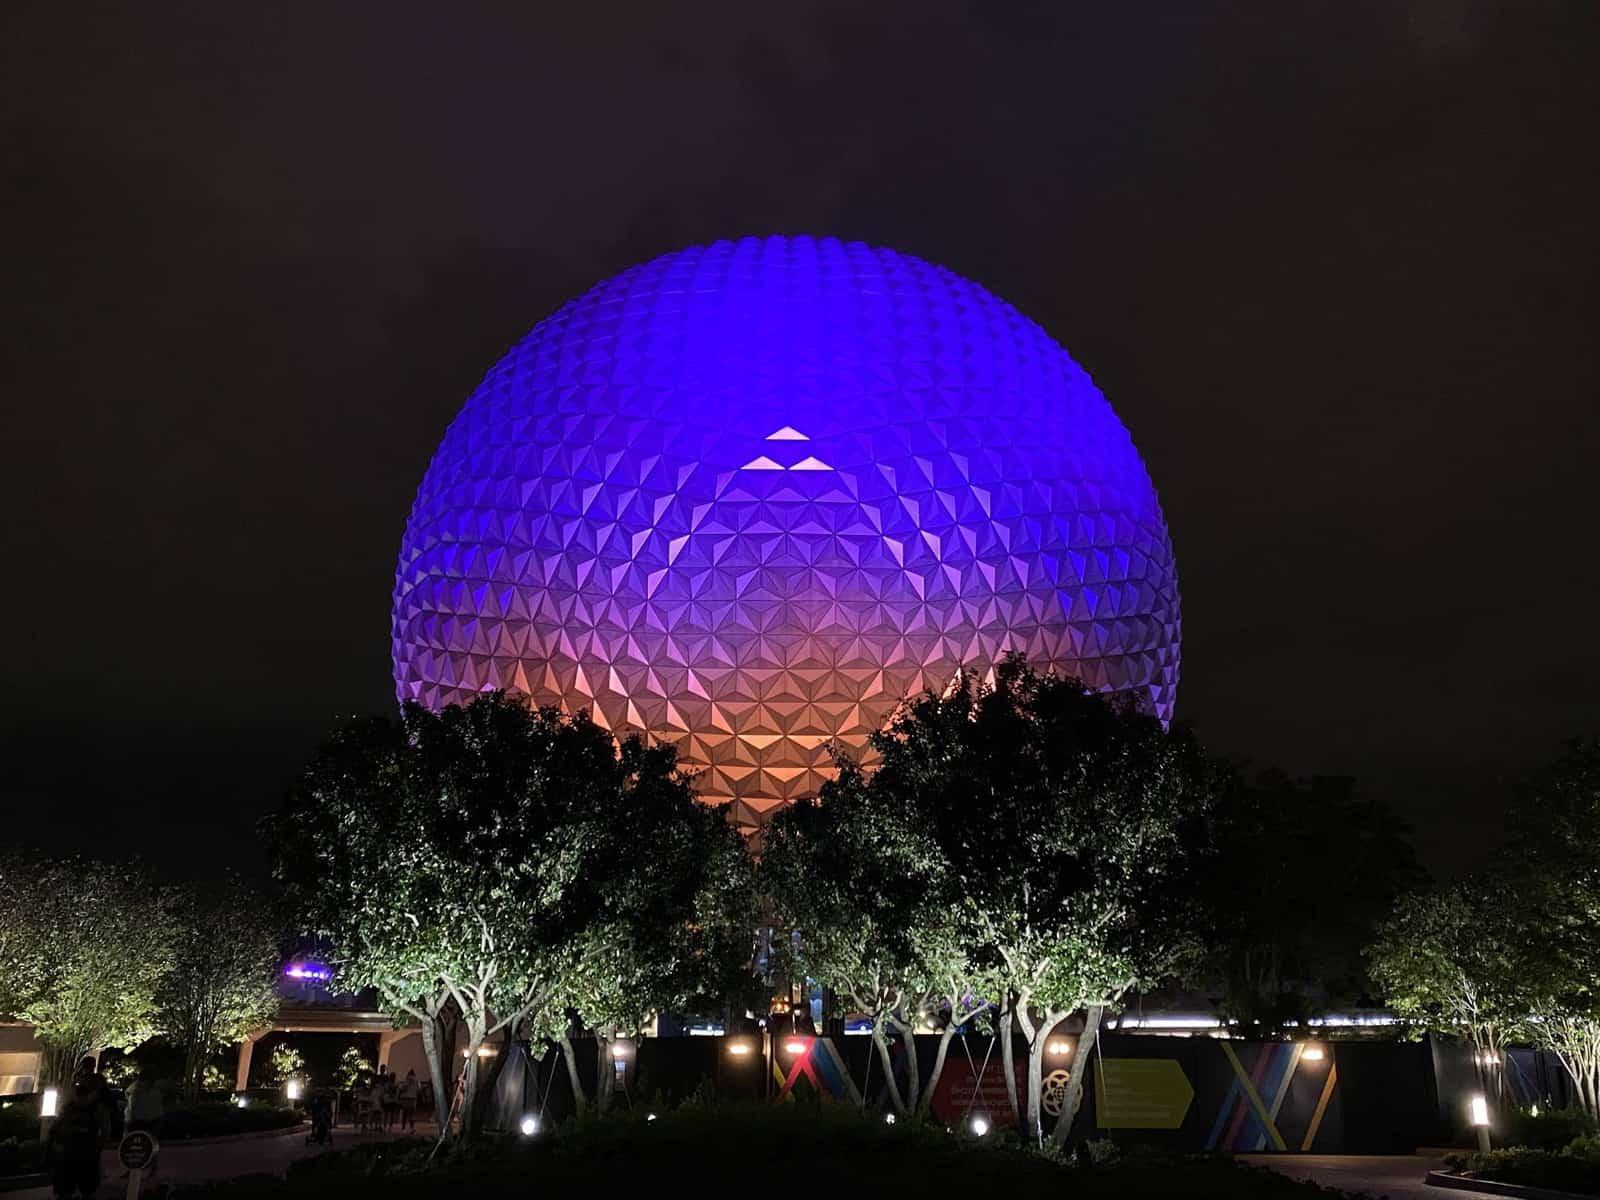 Spaceship Earth at night